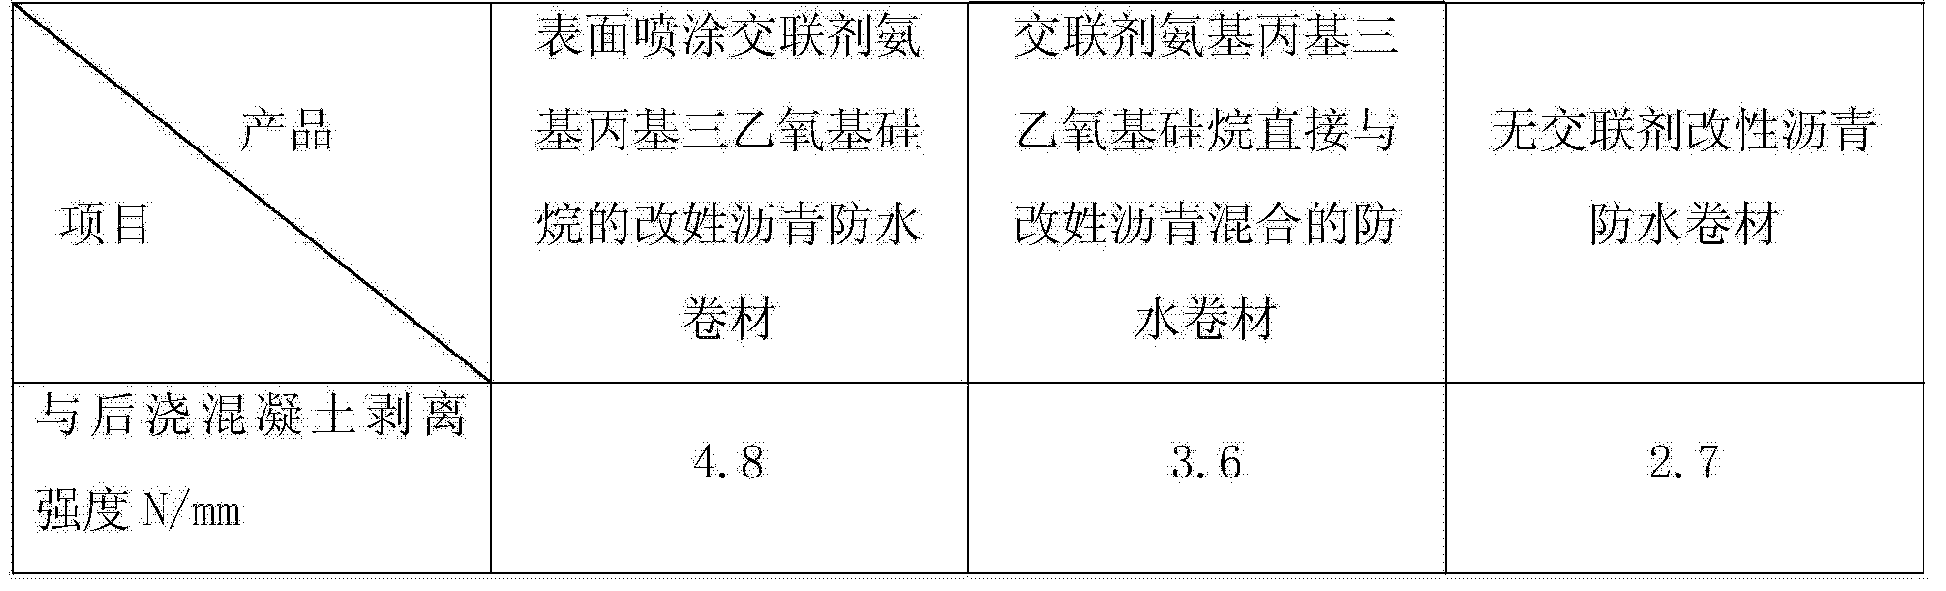 Figure CN204605052UD00091